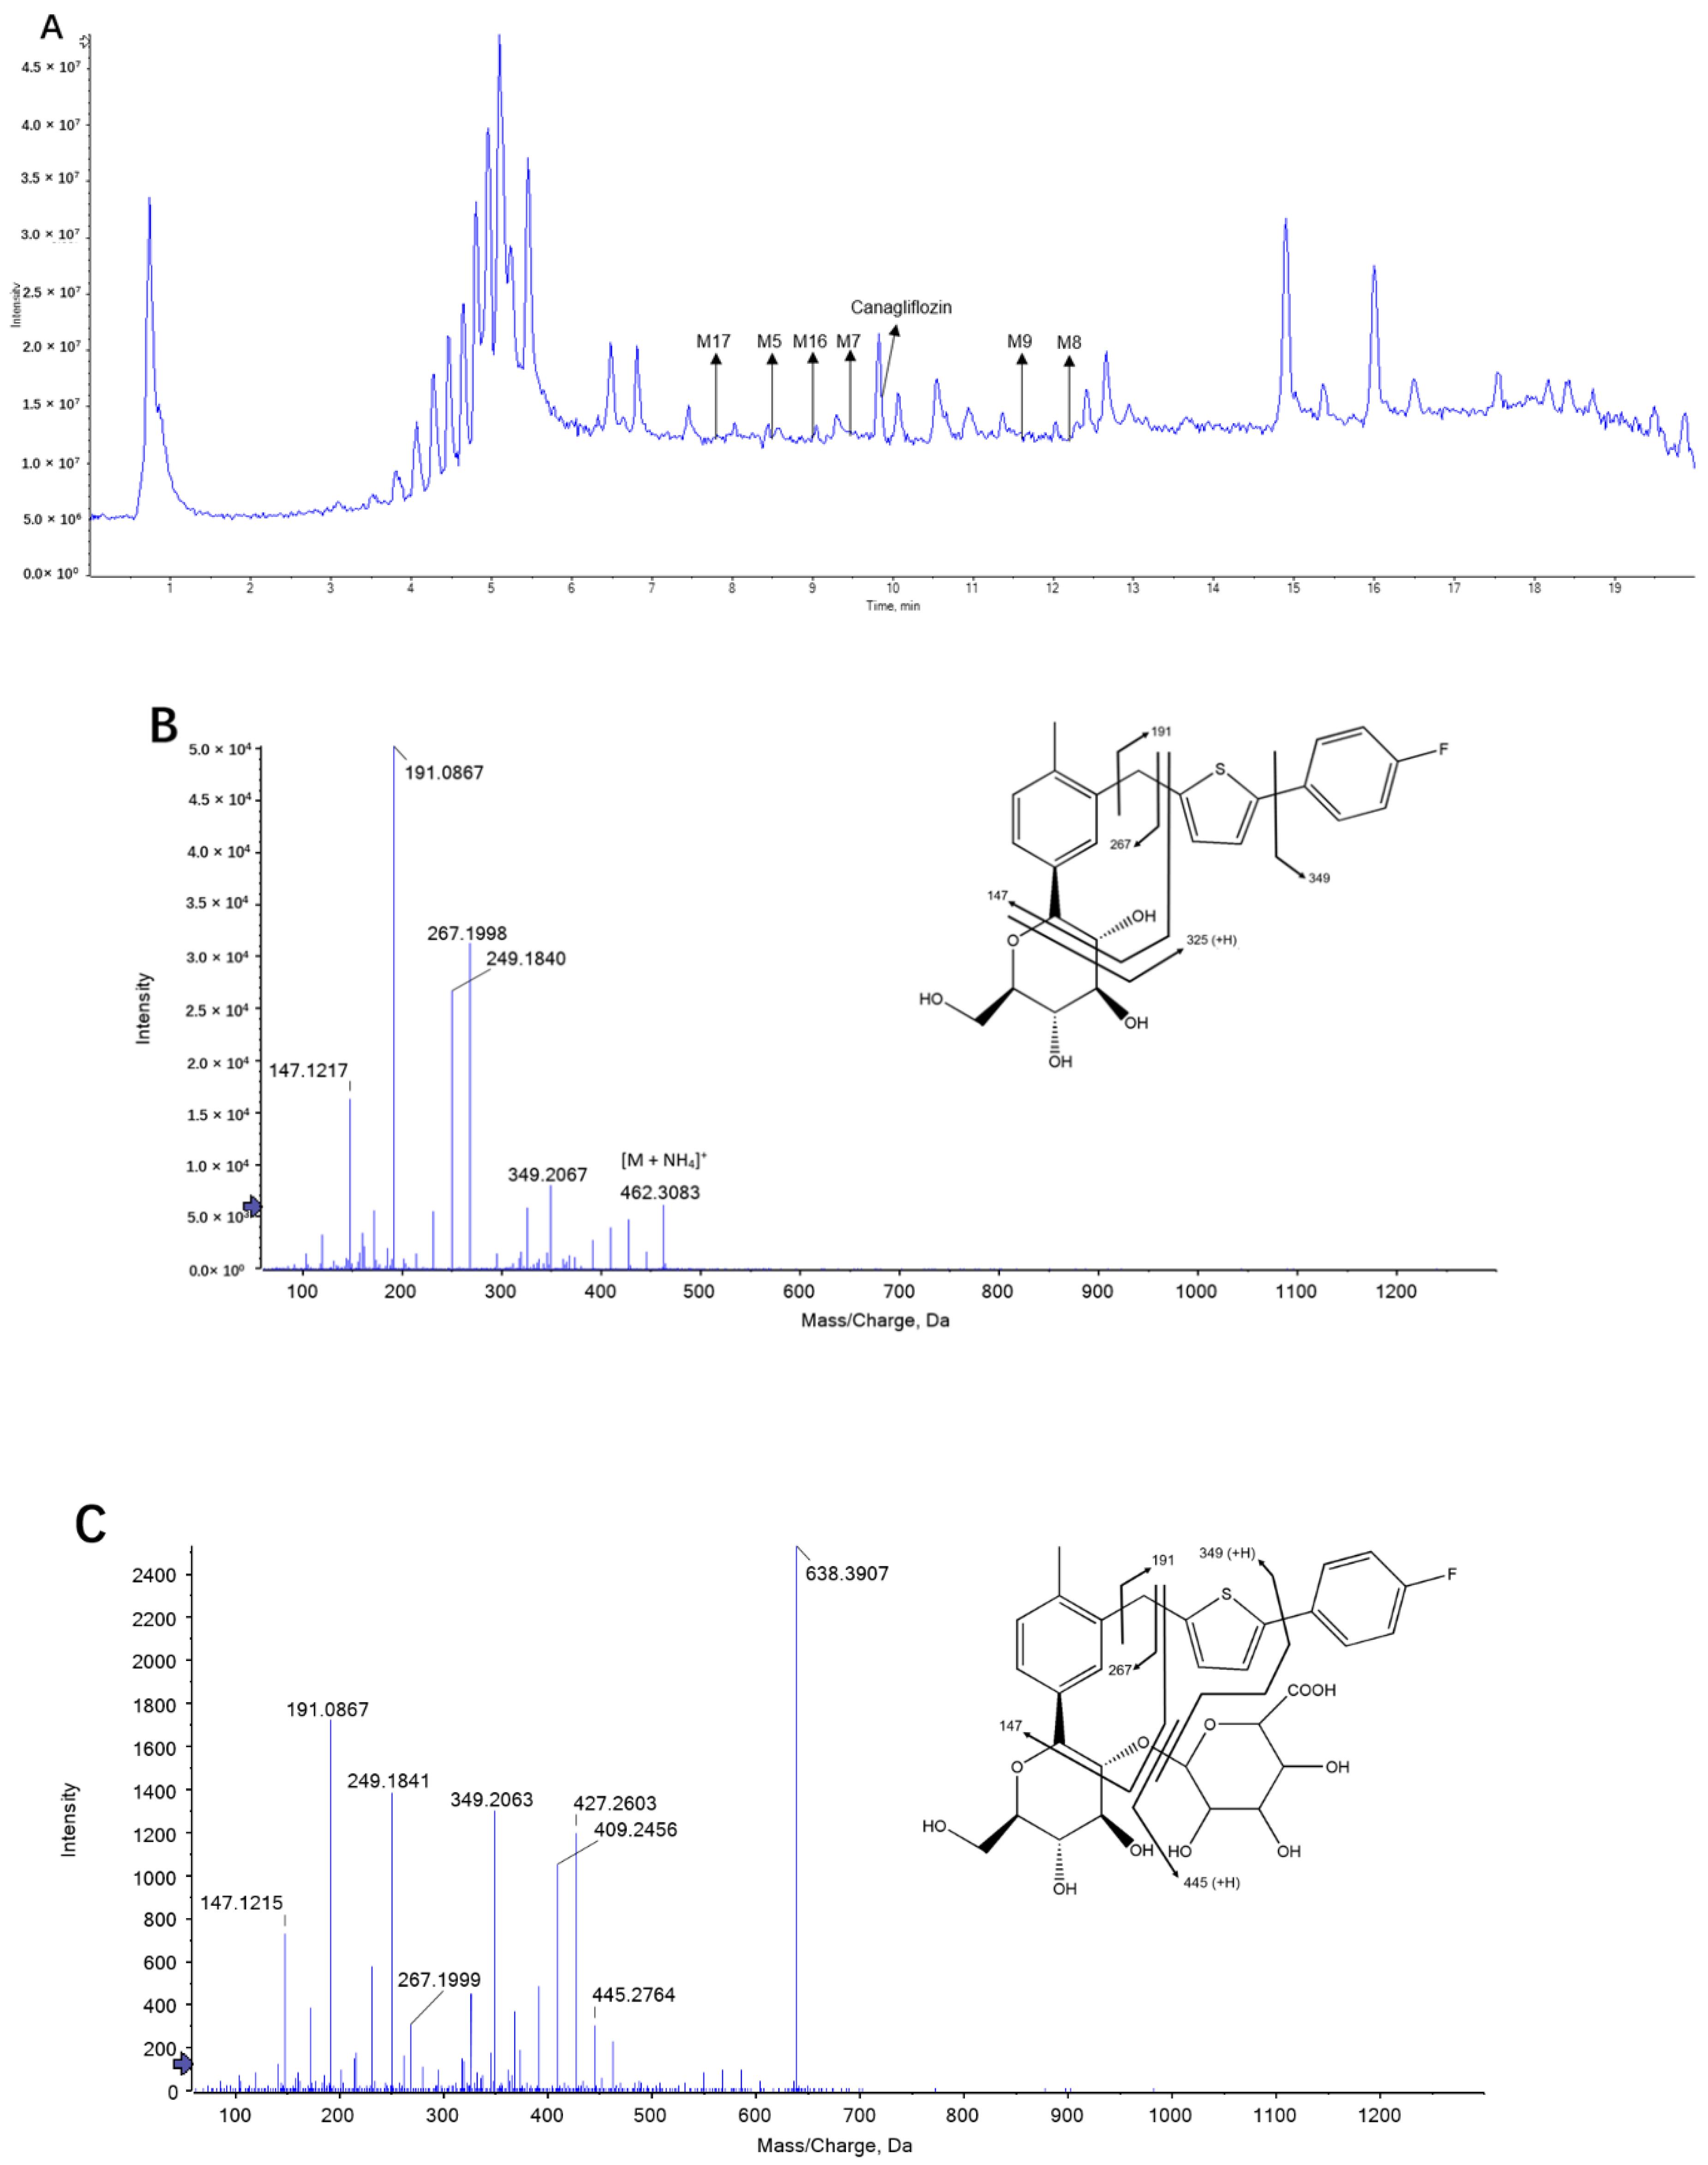 Molecules | Free Full-Text | Plasma Pharmacokinetic